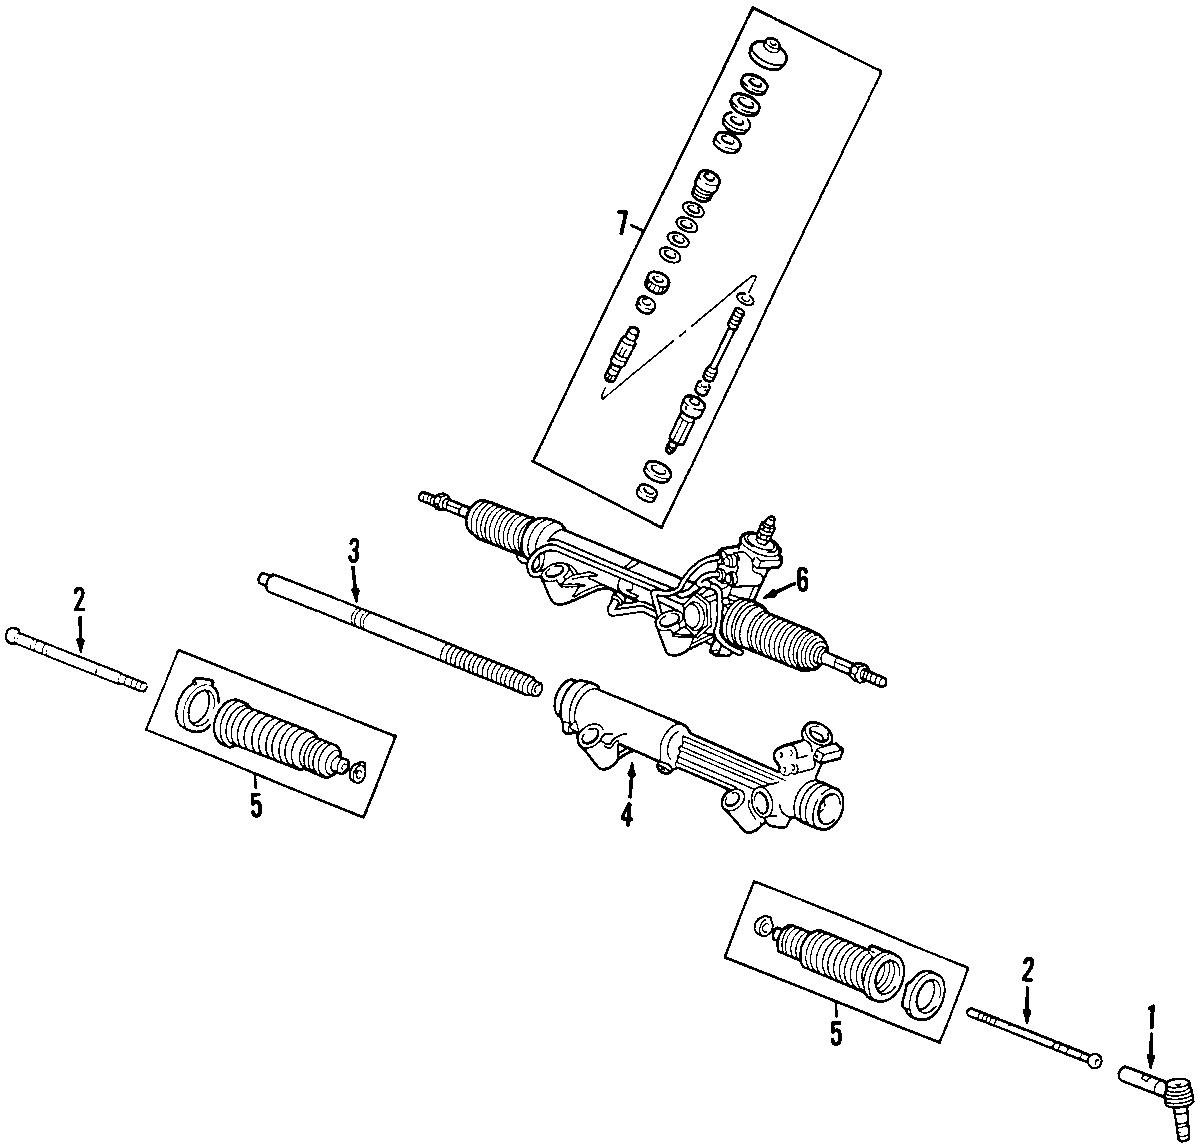 Mazda B Rack And Pinion Assembly